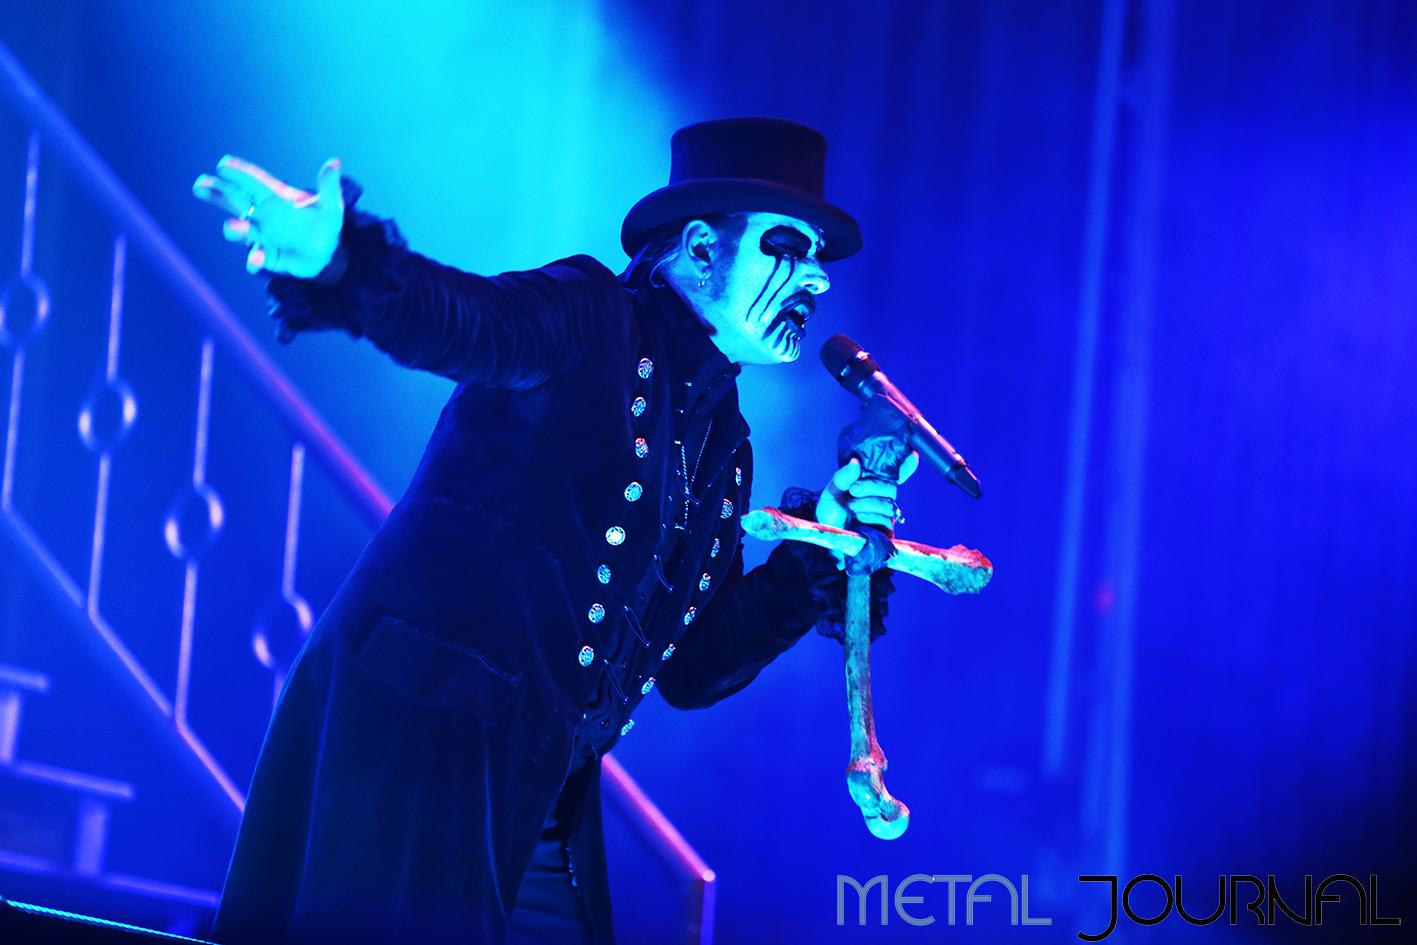 king diamond - metal journal rock fest barcelona 2019 pic 1